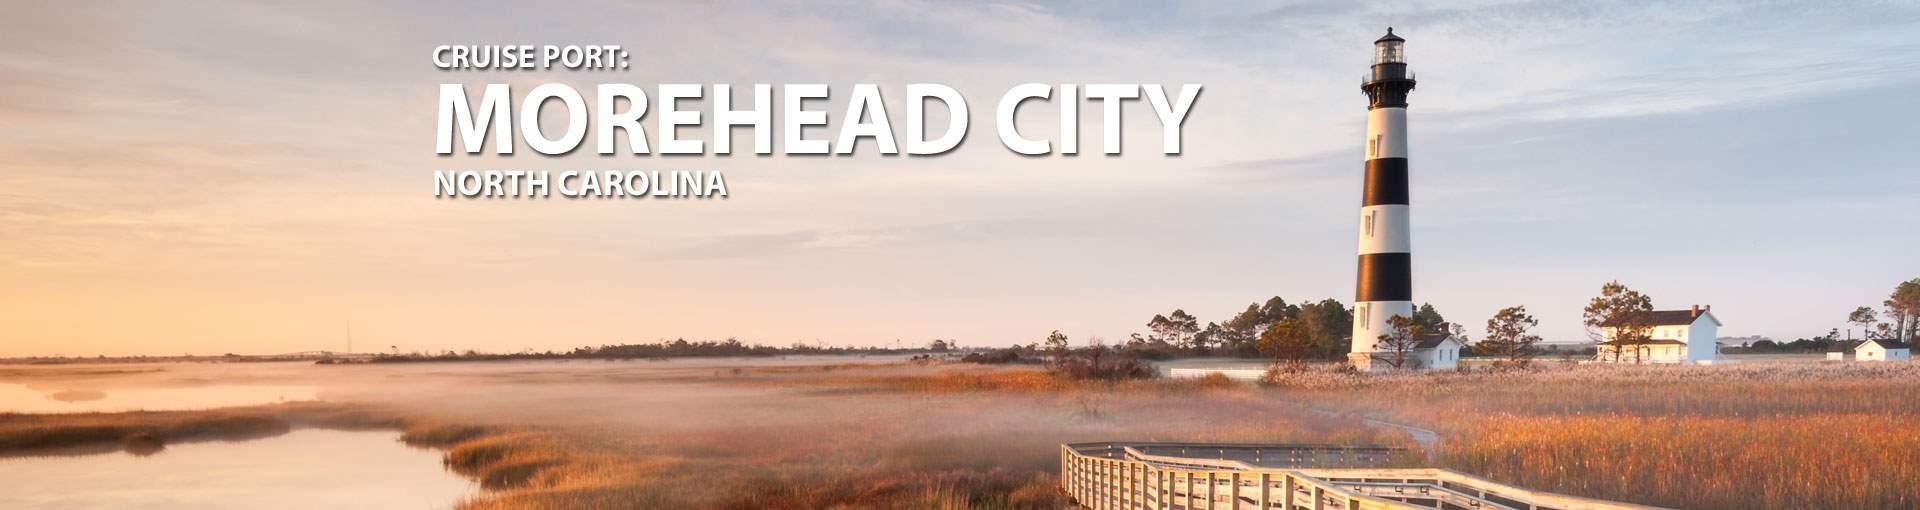 Cruises to Morehead City, North Carolina